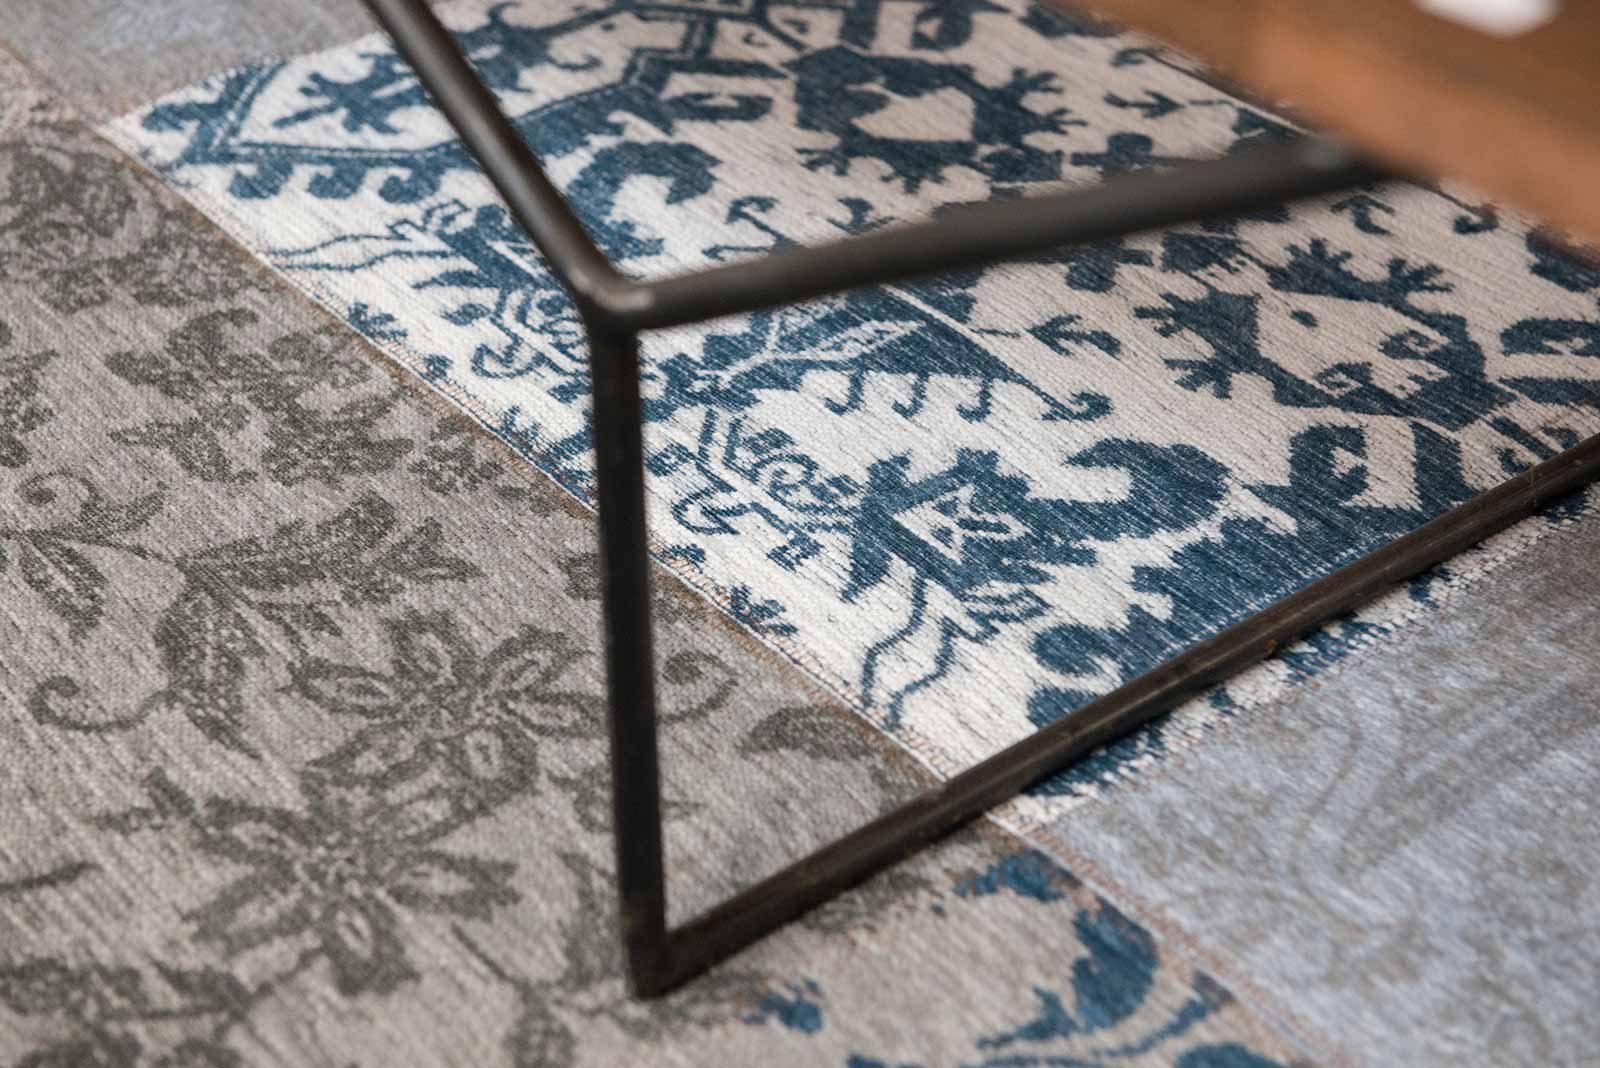 alfombras Louis De Poortere LX8981 Vintage Bruges Blue zoom 1